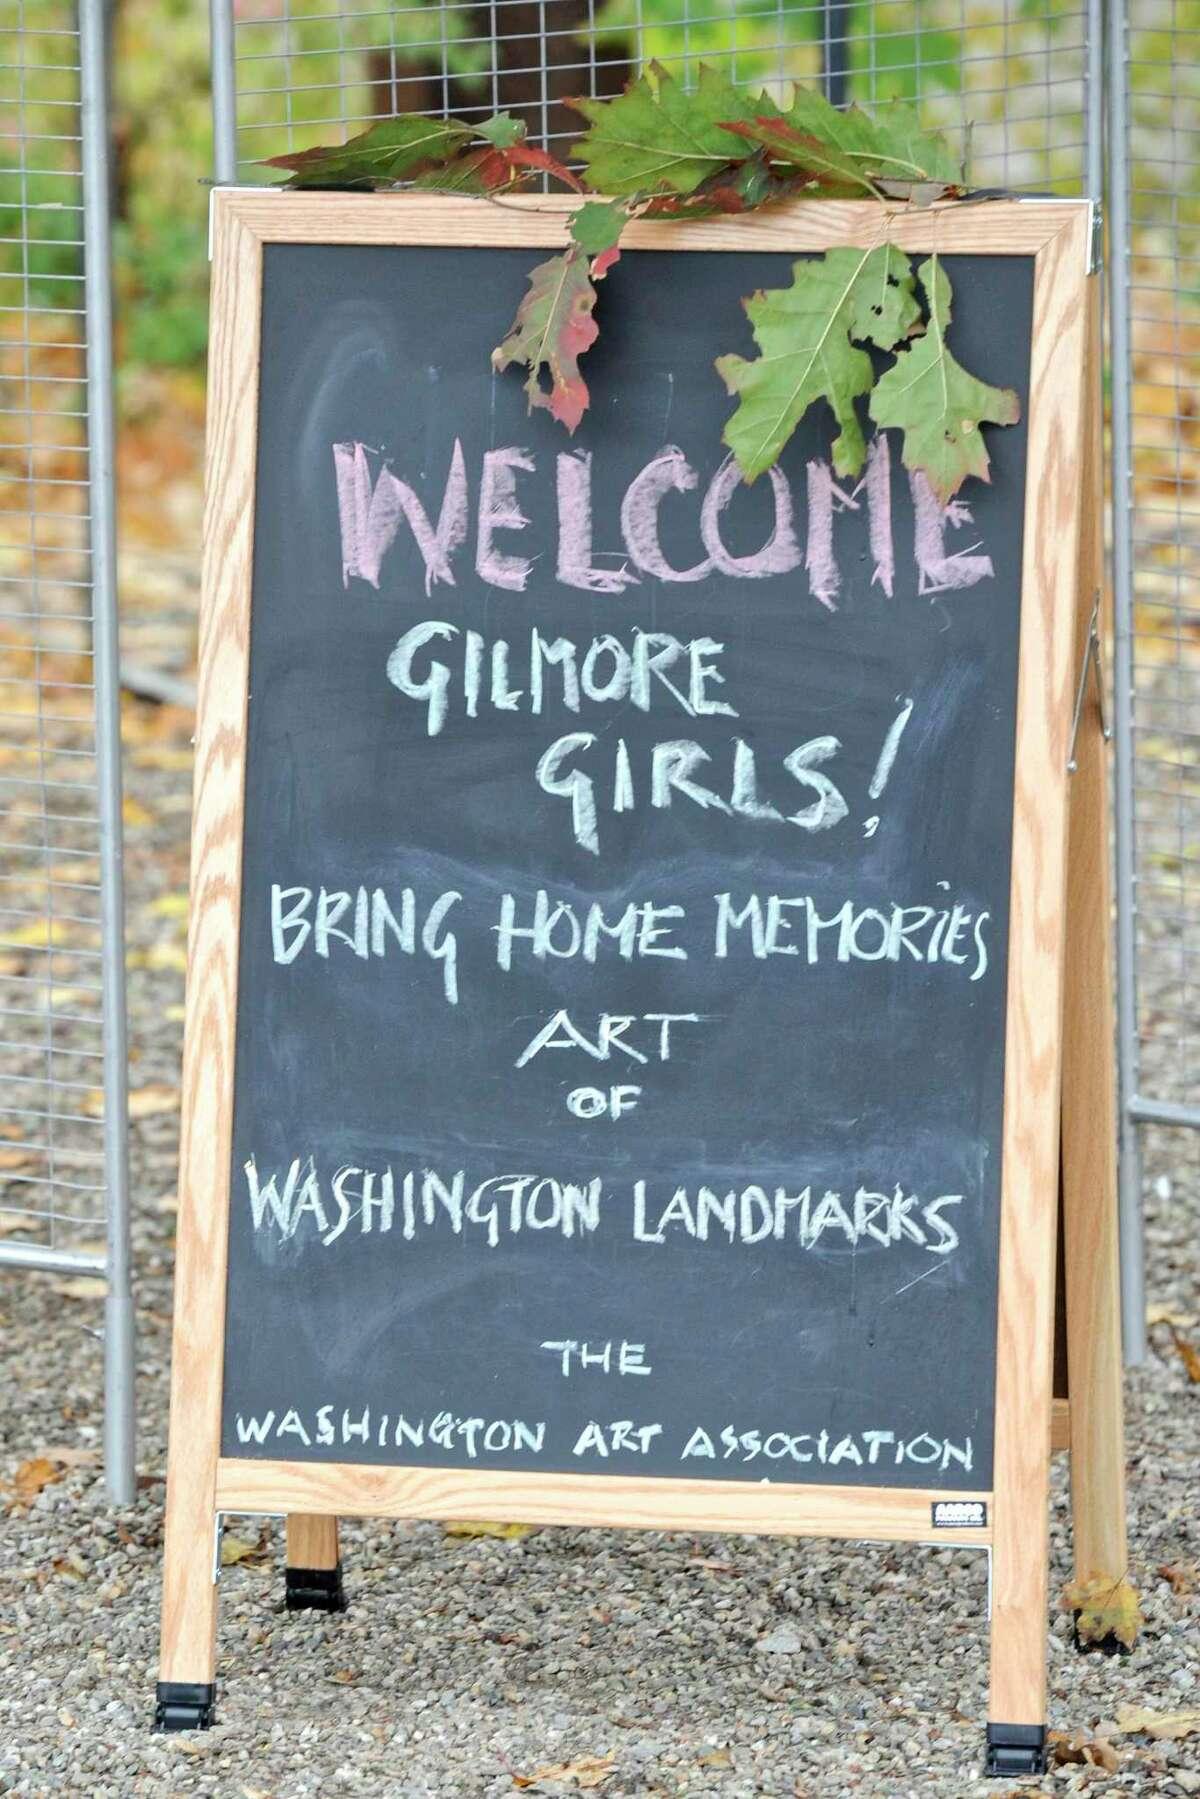 Gilmore Girls Fan Fest in Washington Depot, Conn, on Saturday, October 22, 2016.